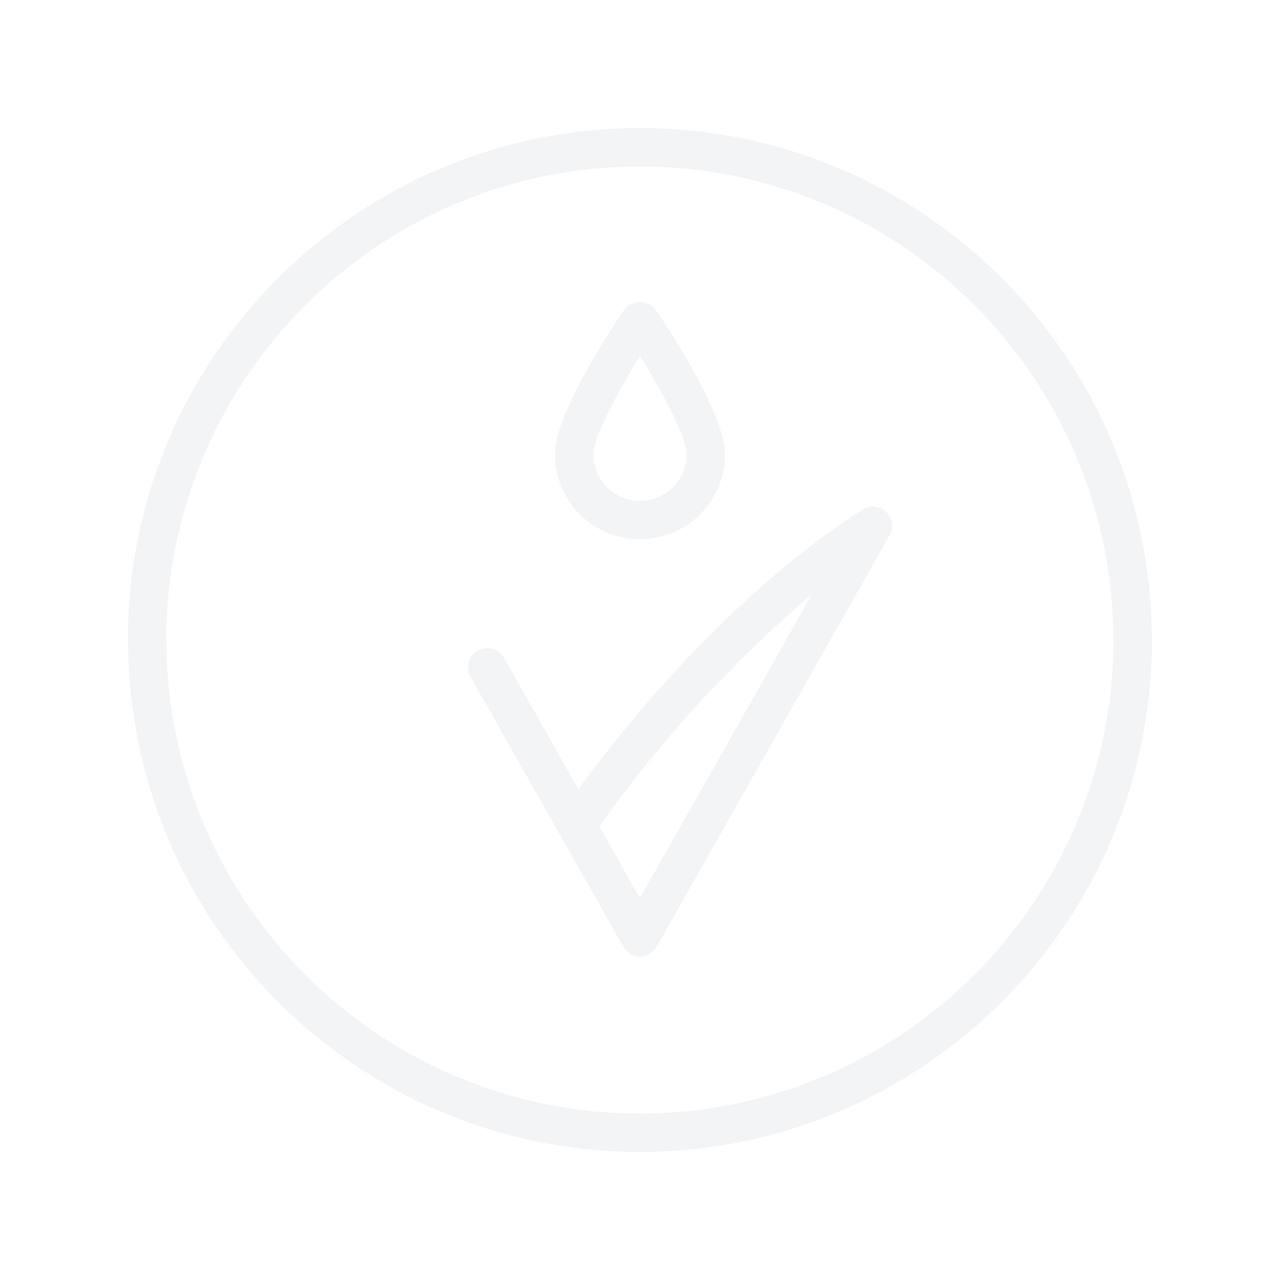 ANNA LOTAN Delicate Replenisher For Eye Contour 30ml